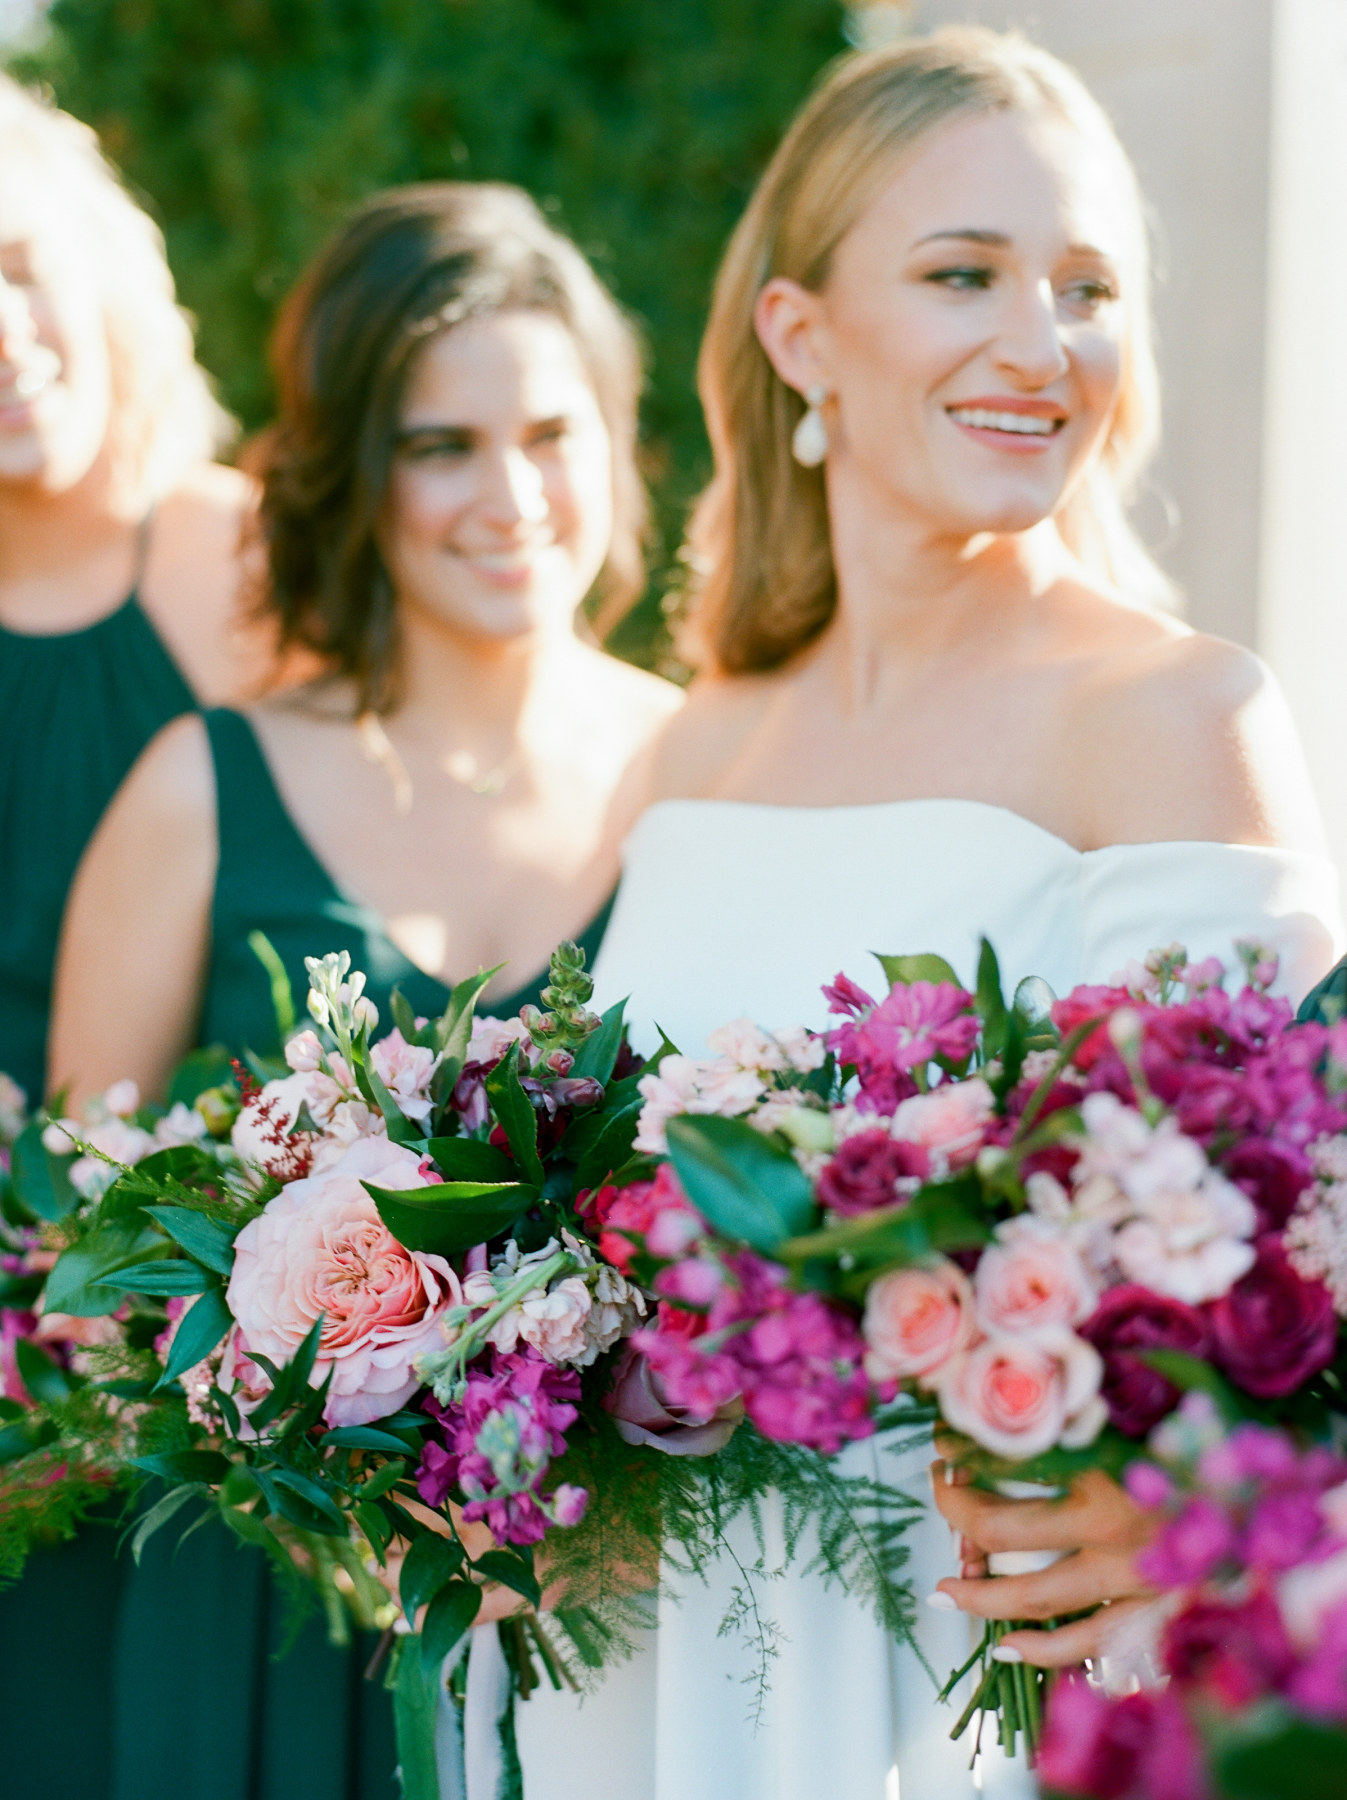 34Great_Marsh_Estates_Wedding_Anne_Kelley_Events_Astrid_Photography146486010011-2